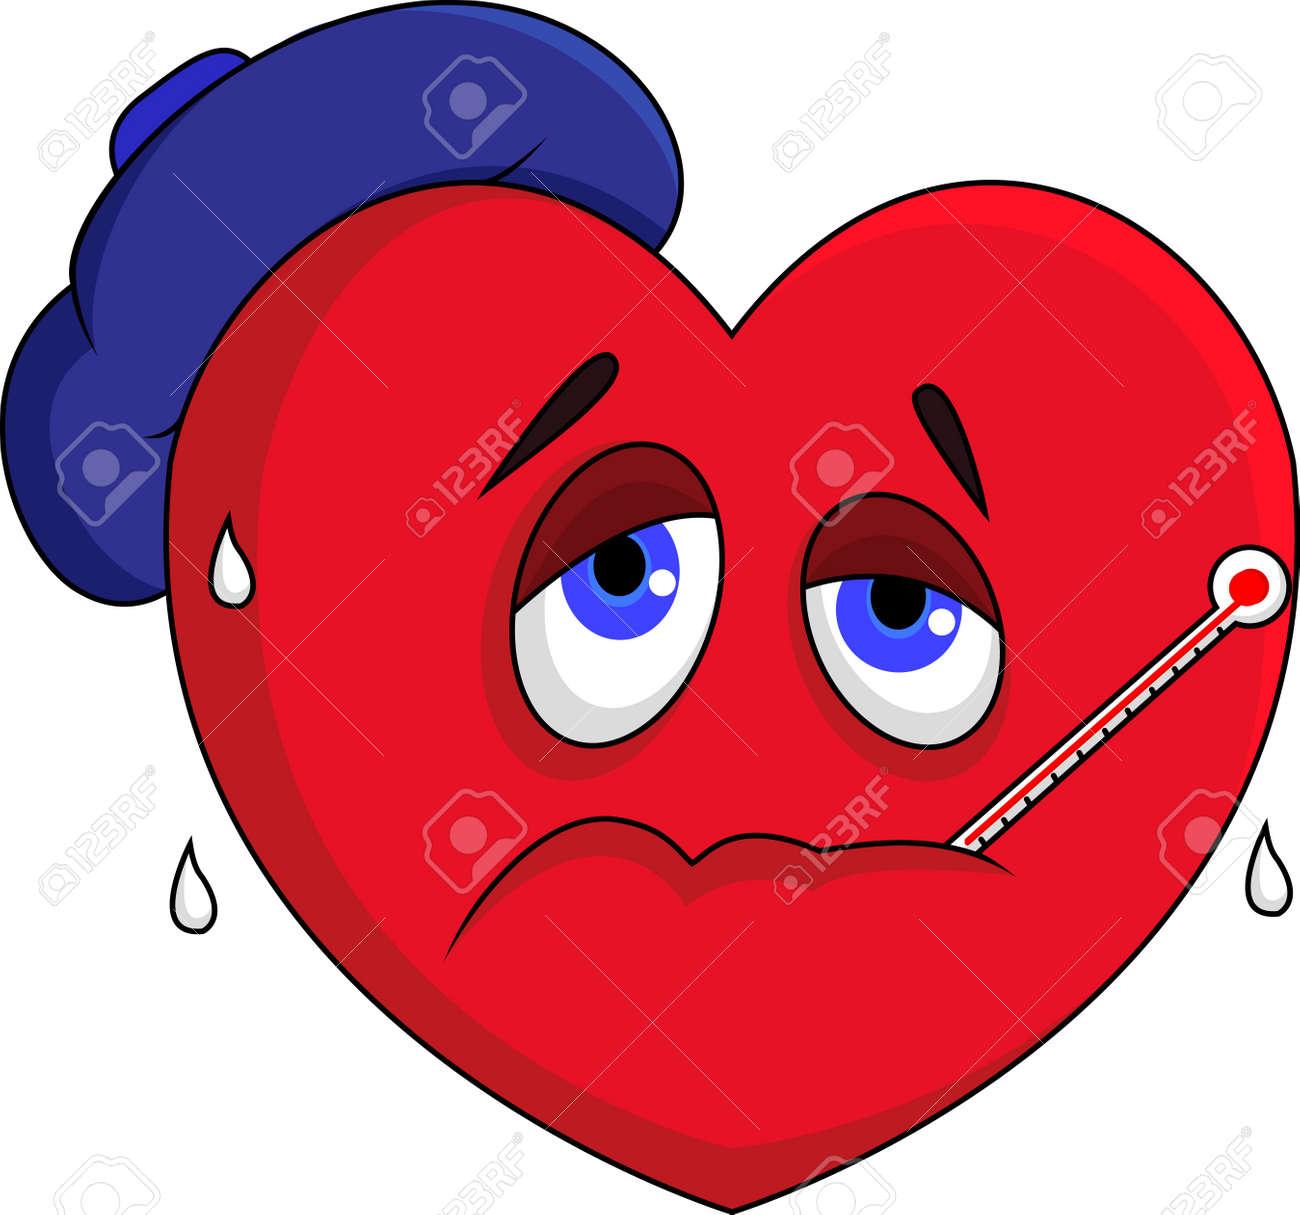 Sick heart character - 15234033